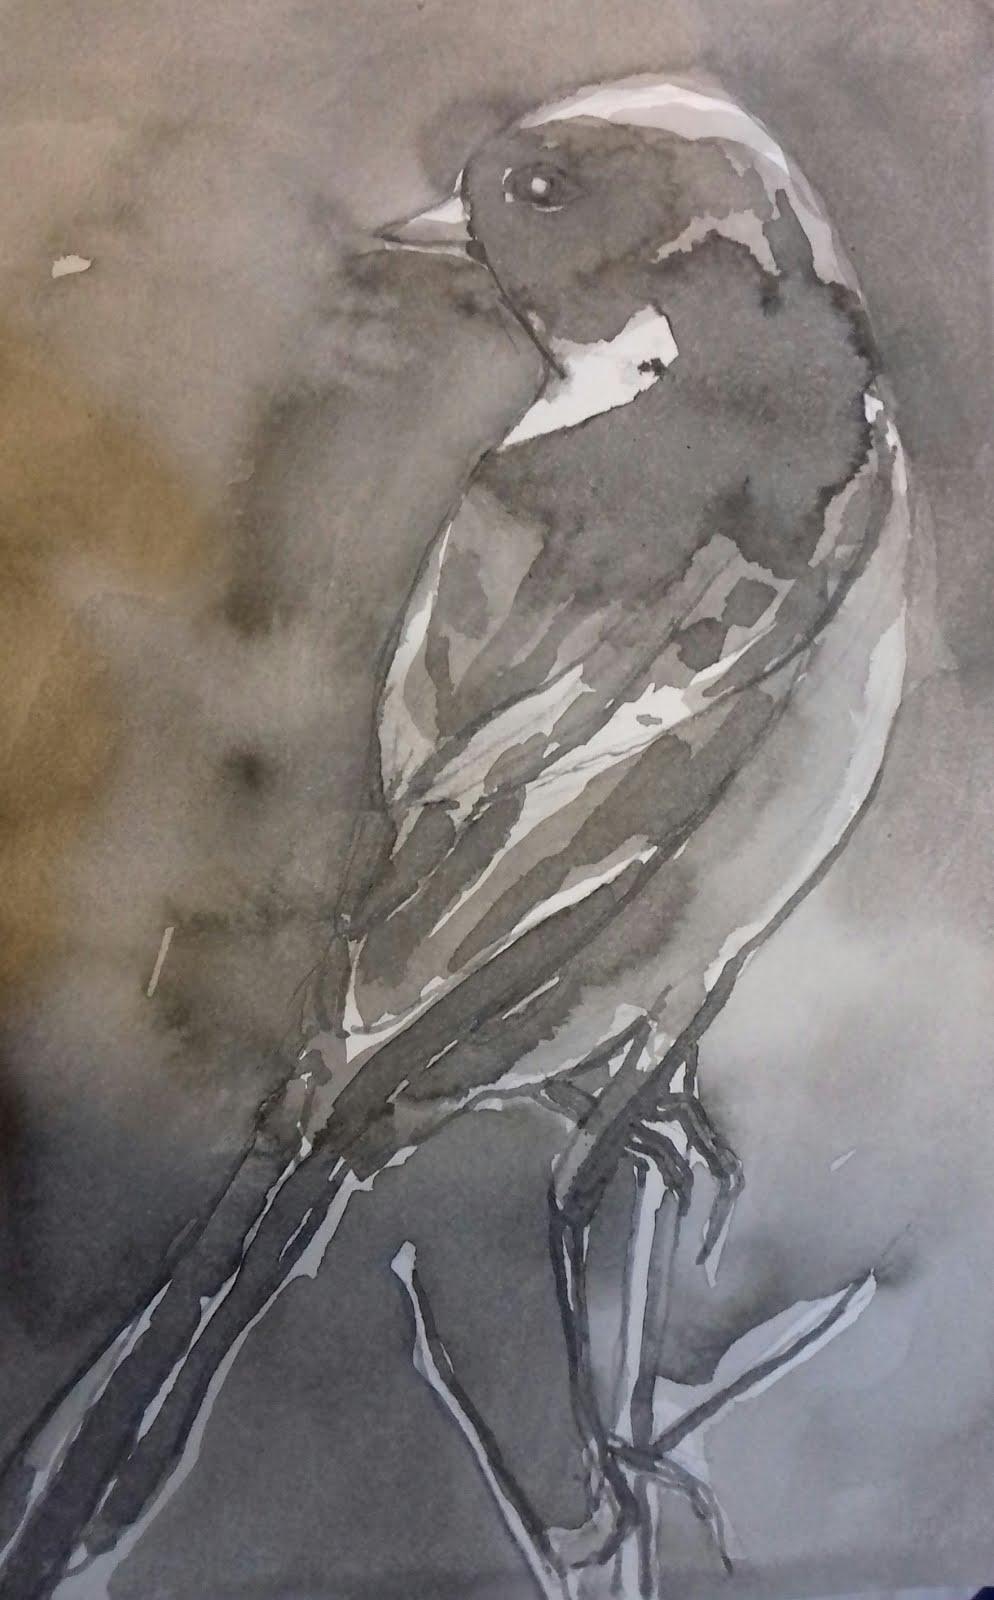 Otro bird onwire